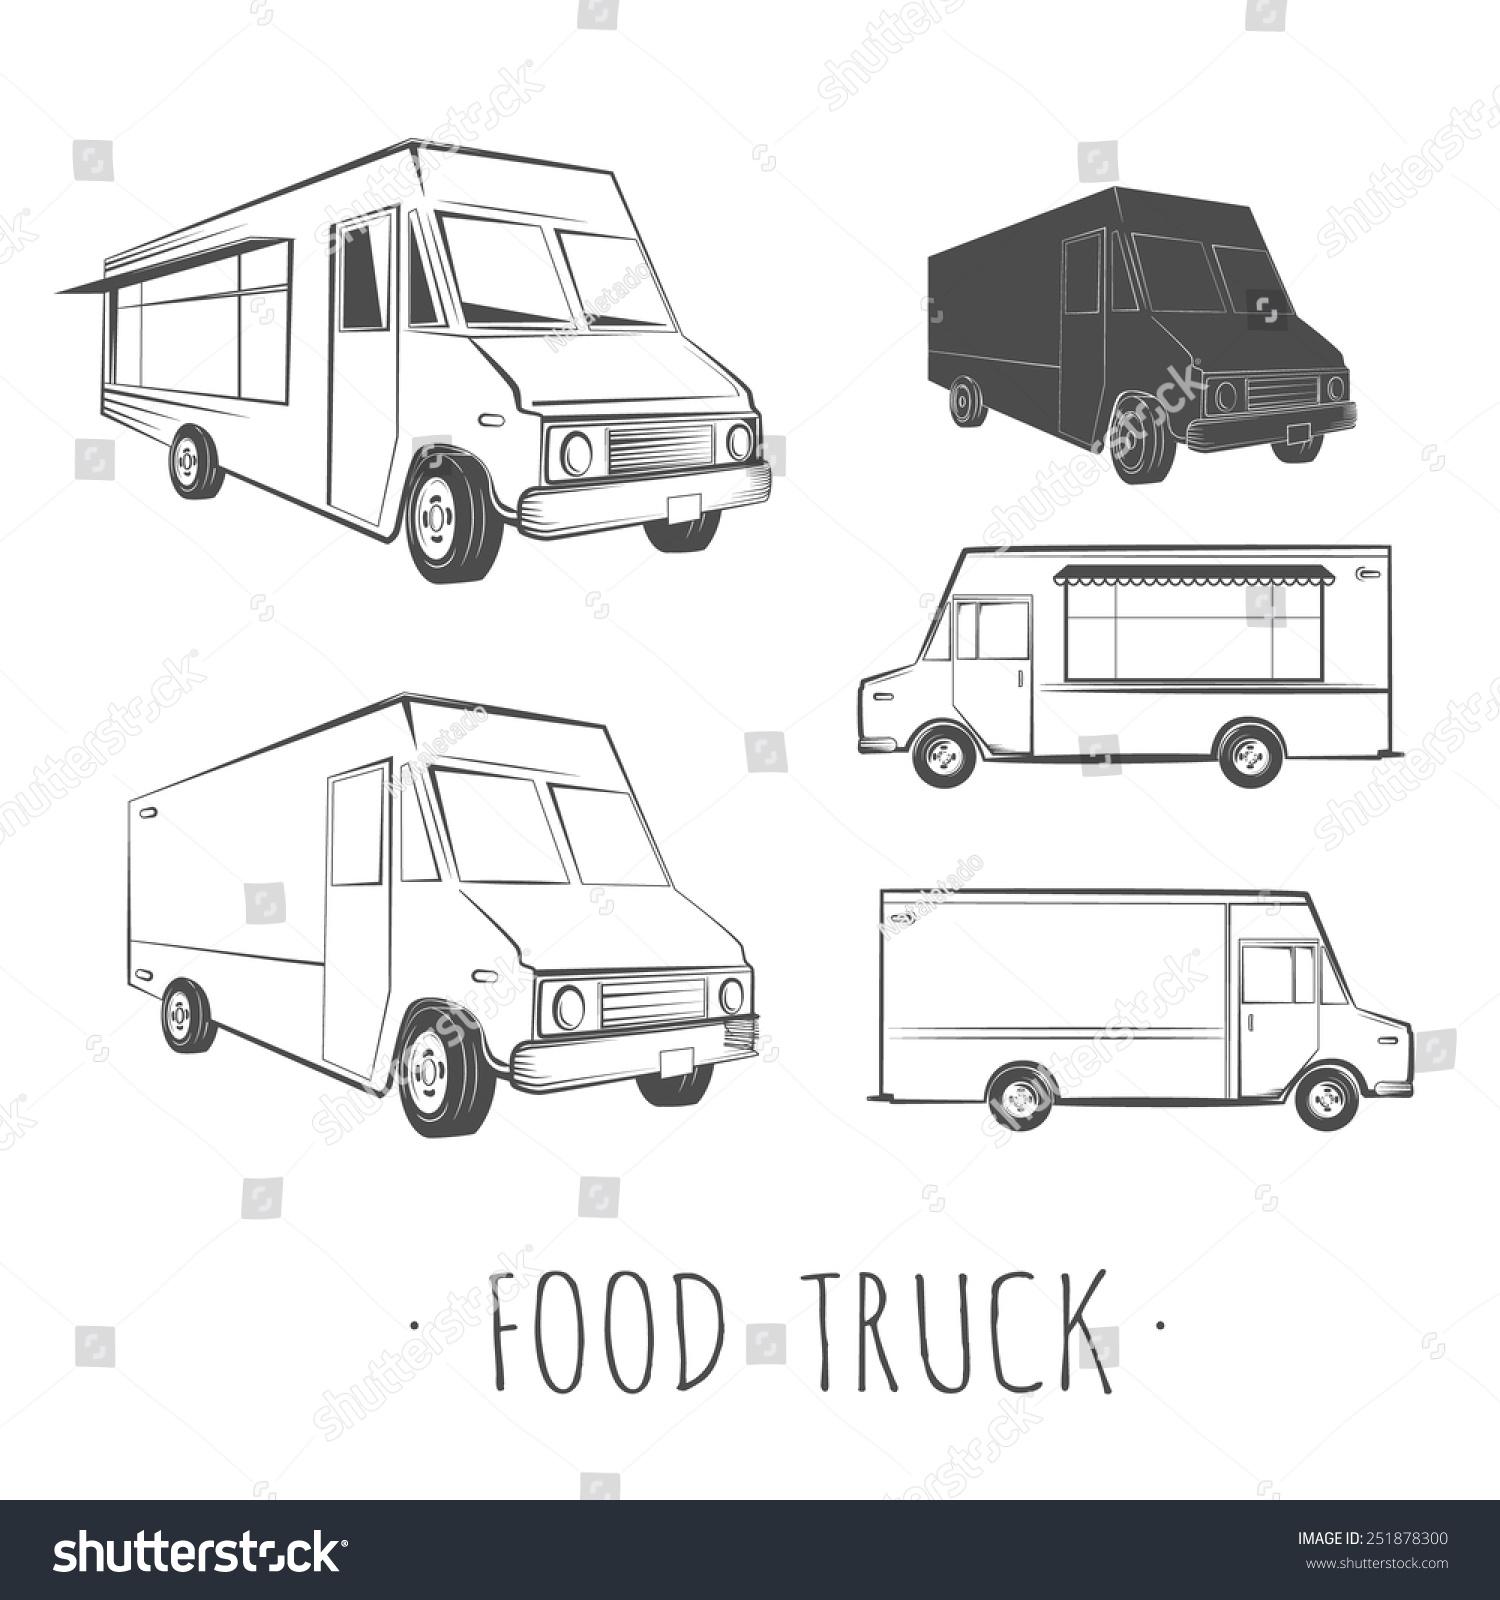 Food Truck Blank Stock Vector 251878300 Shutterstock